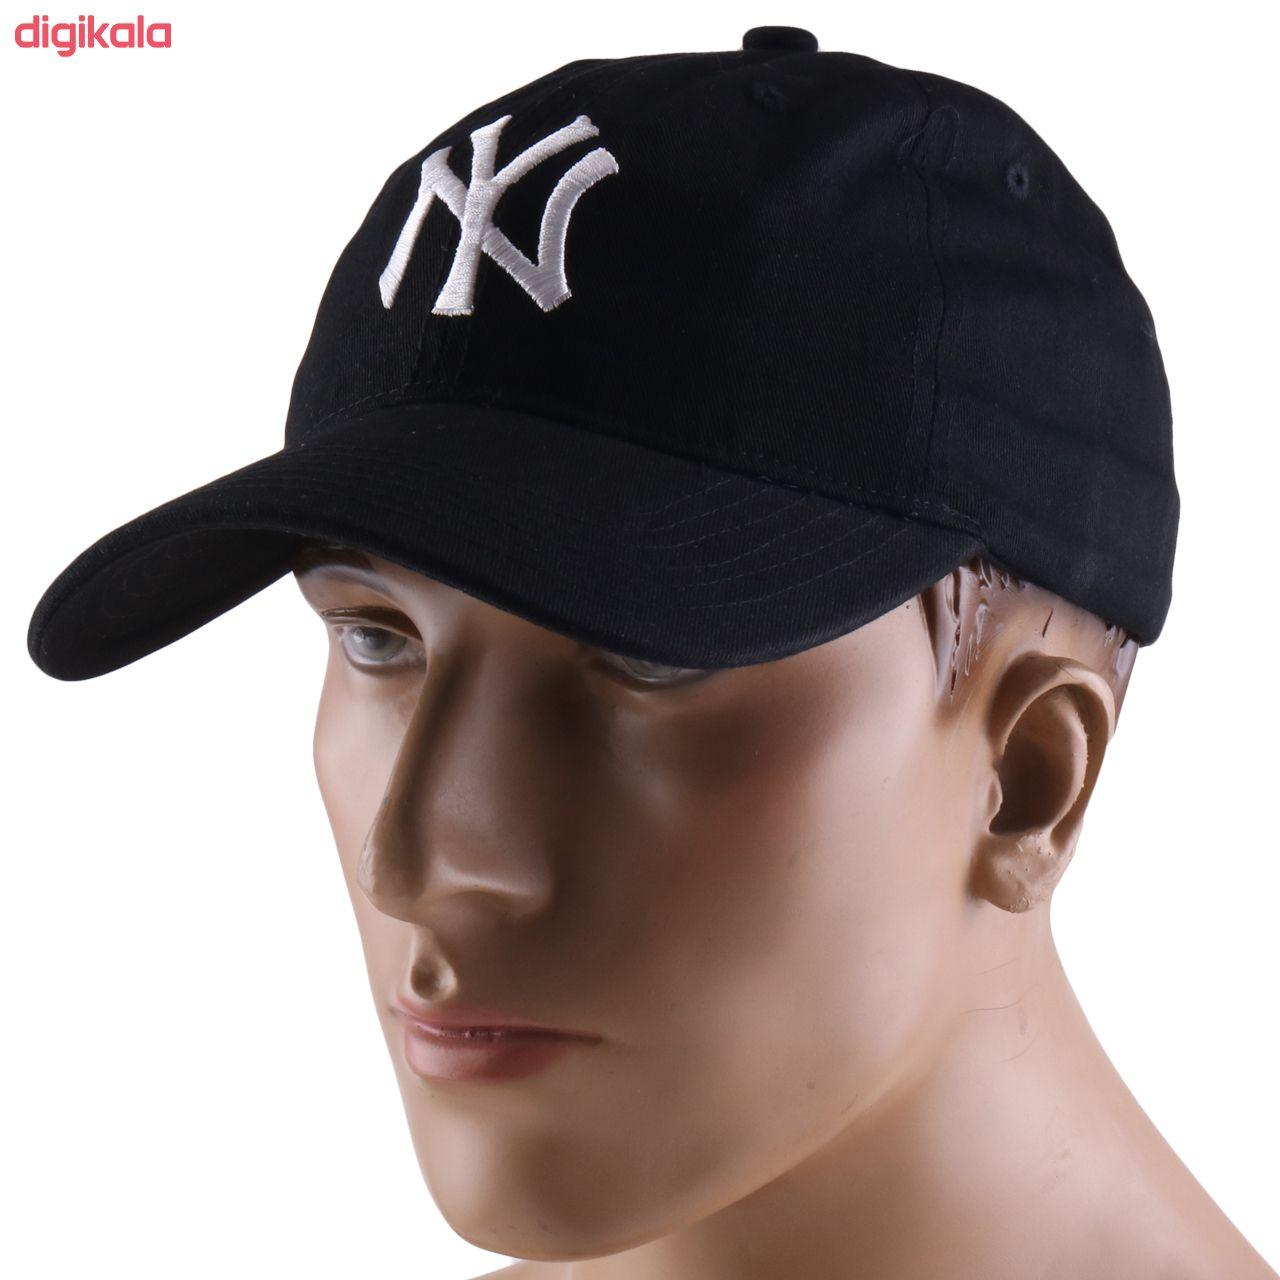 کلاه کپ طرح NY کد 4832 main 1 3